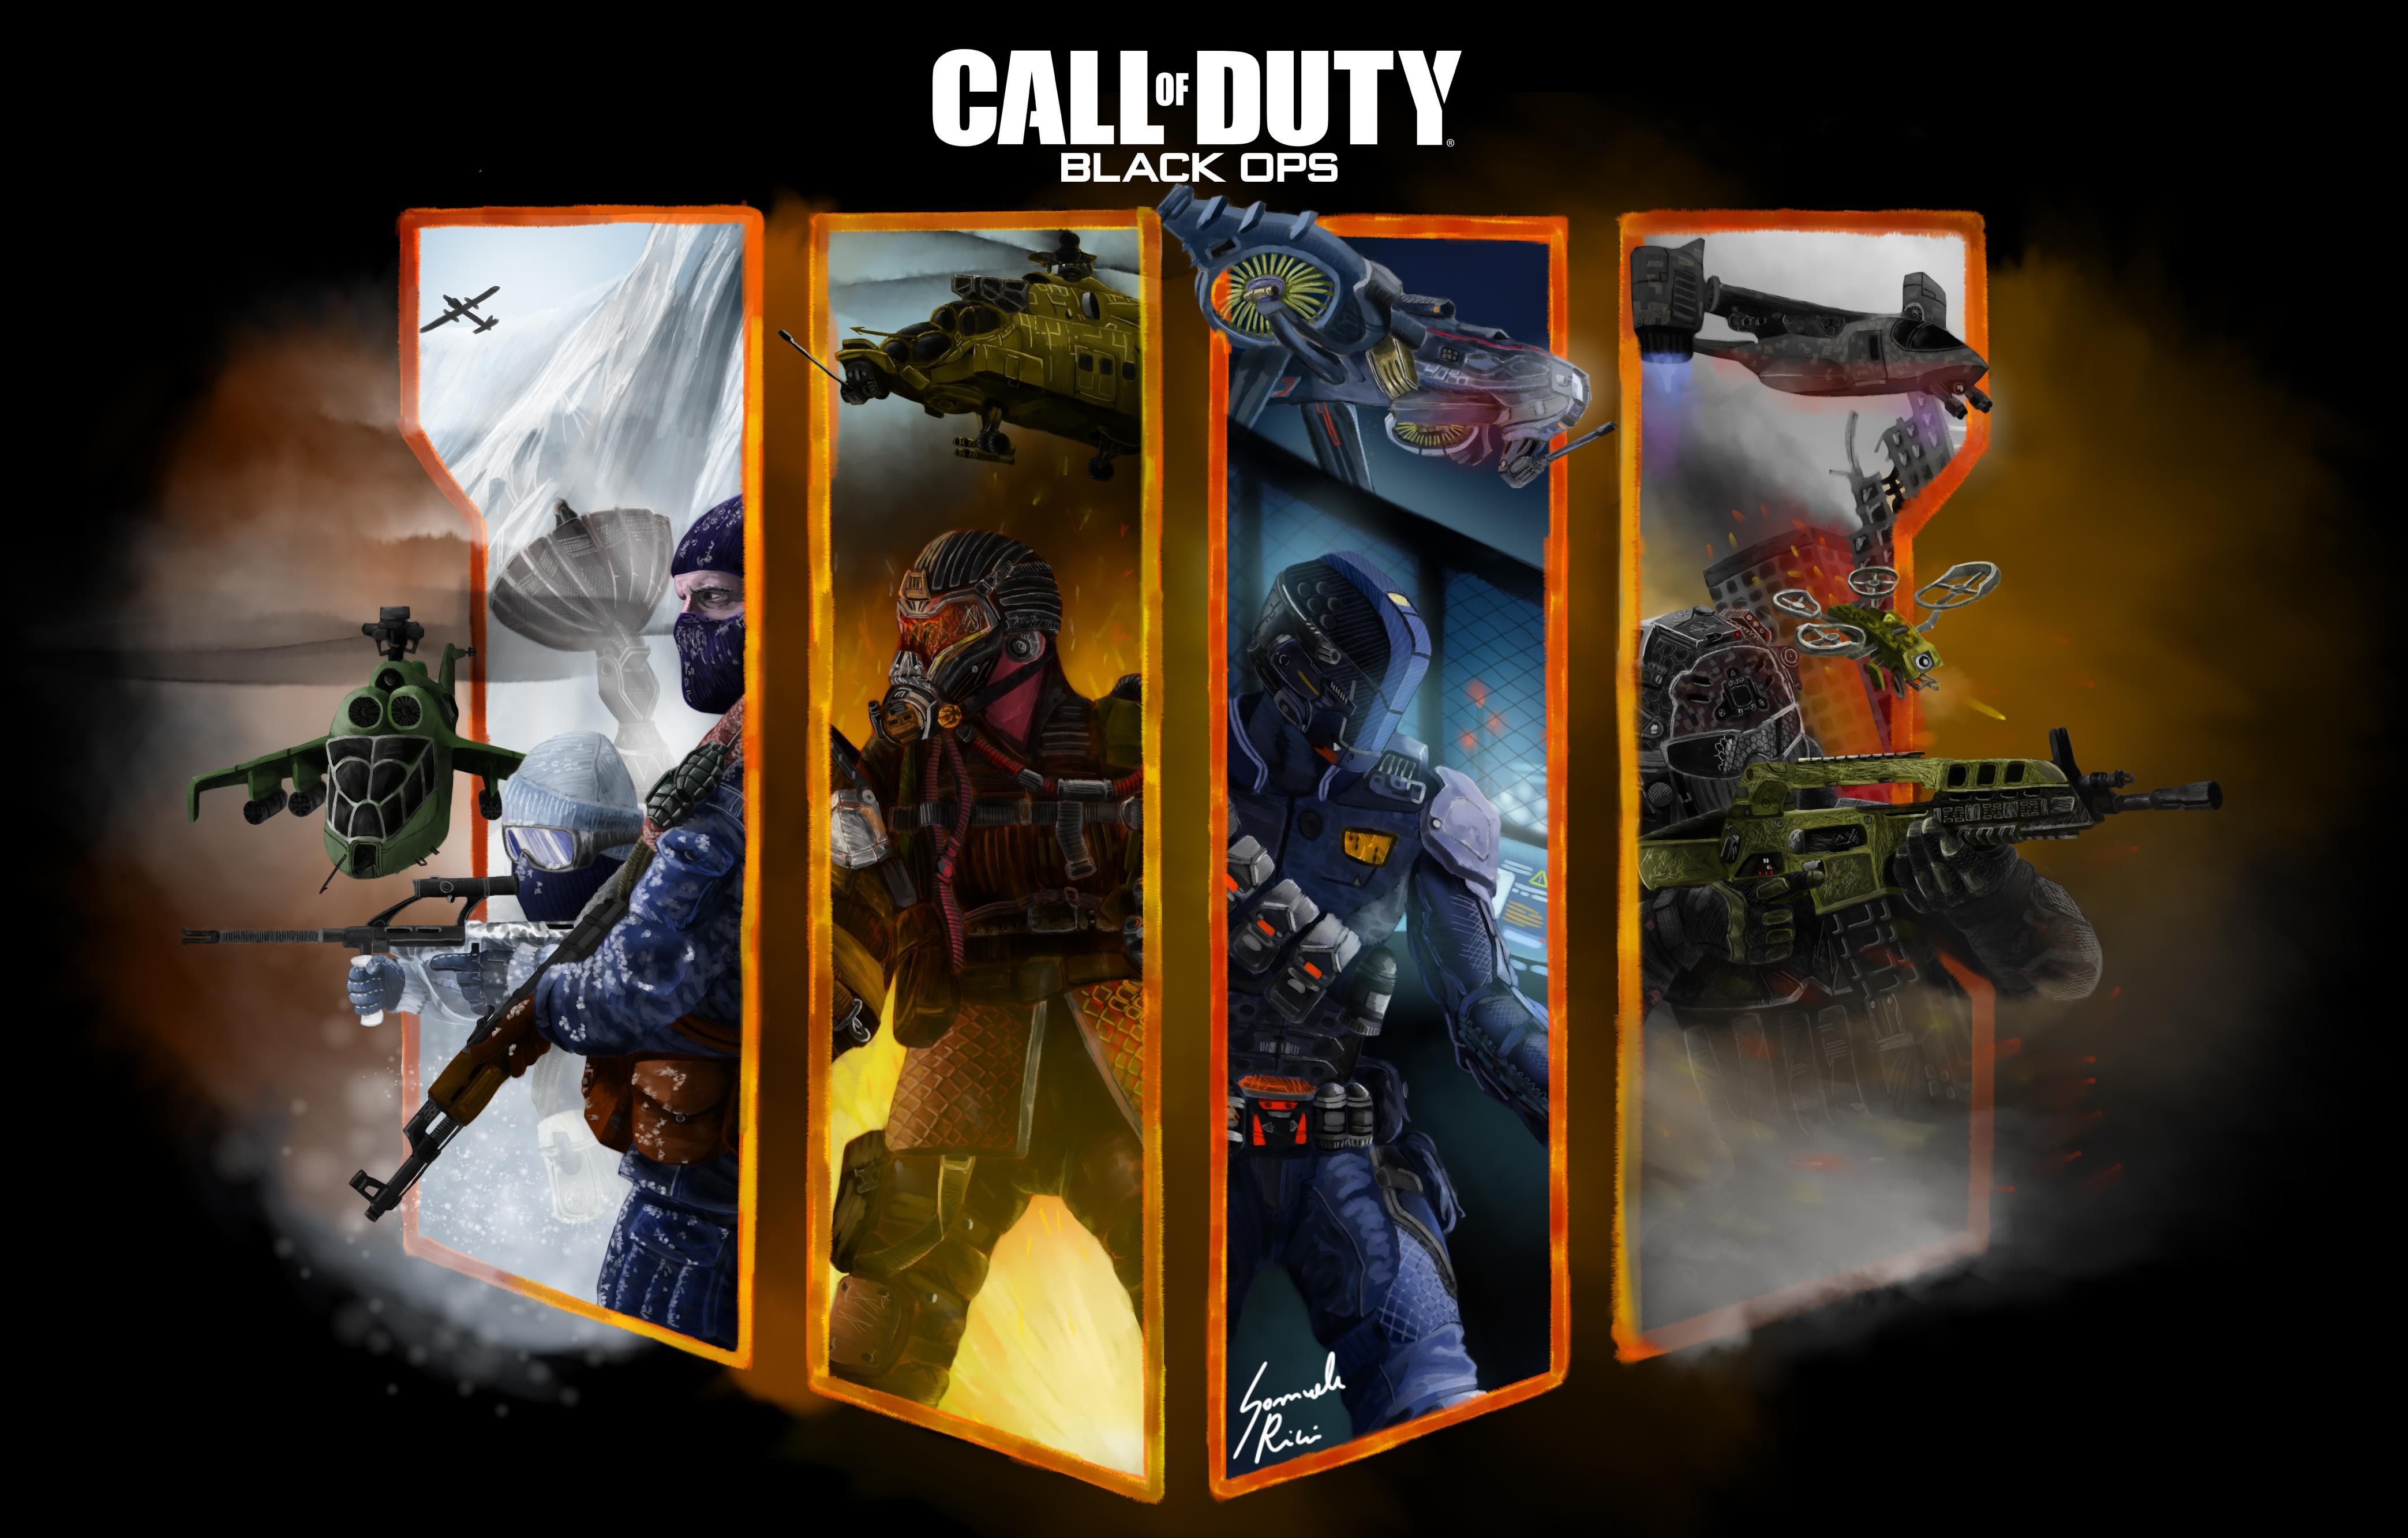 Call Of Duty Black Ops 4 Fan Art 4k Hd Games 4k Wallpapers Images